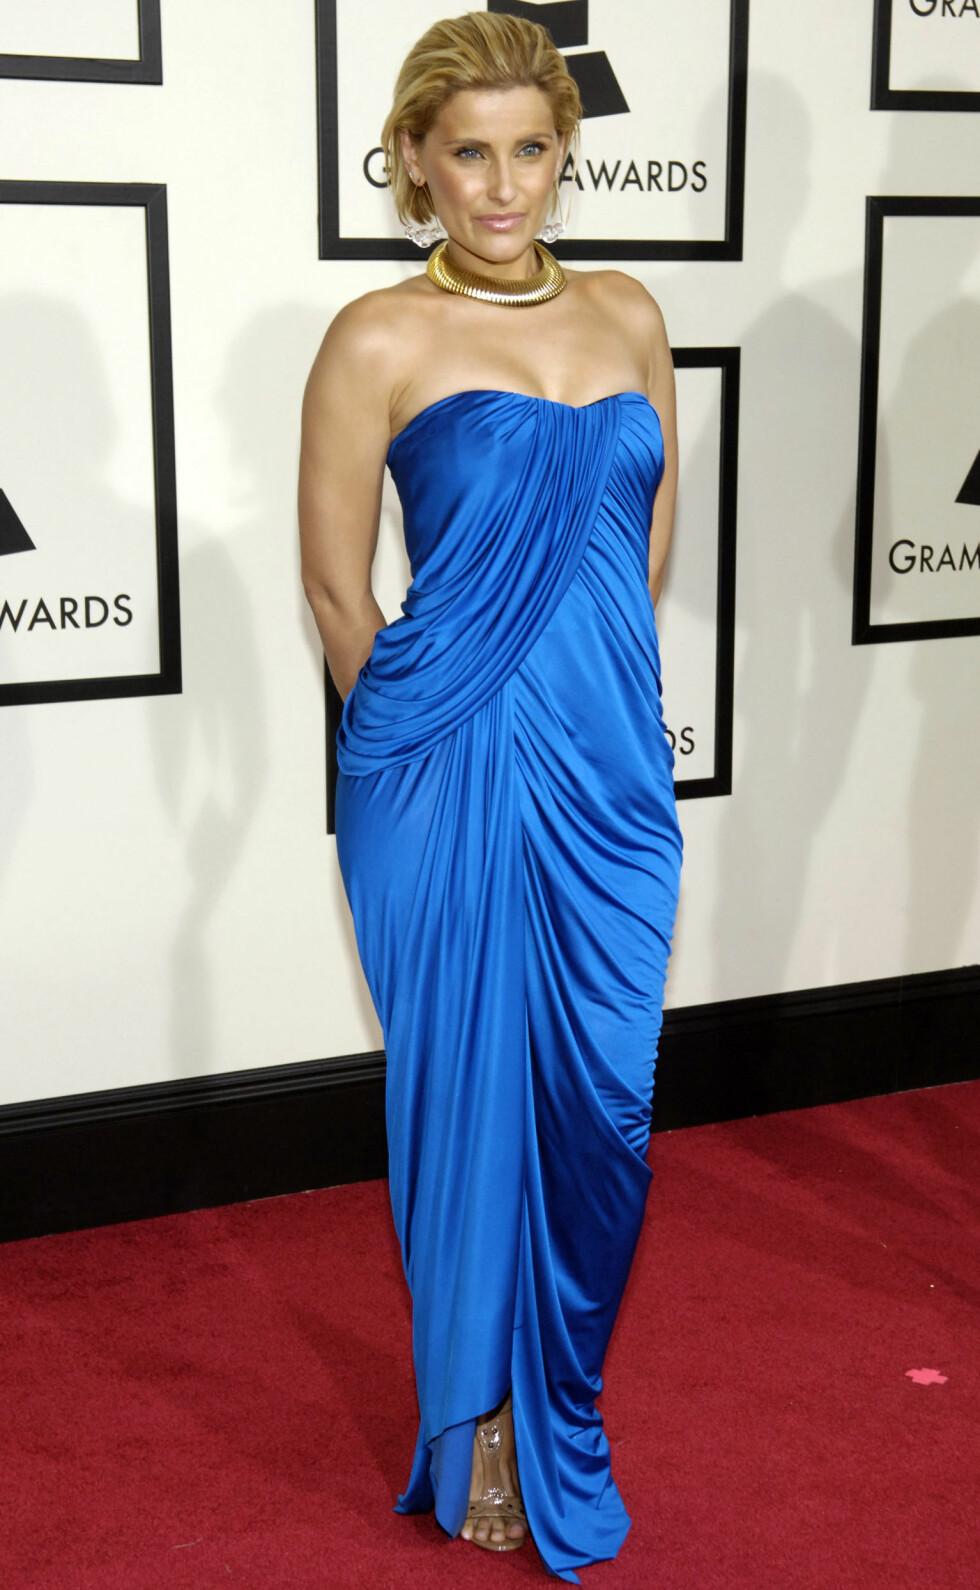 NELLY FURTADO: Den kanadiske artisten Nelly Furtado i en knallblå kreasjon under Grammy-utdelingen i 2008. Foto: NTB Scanpix